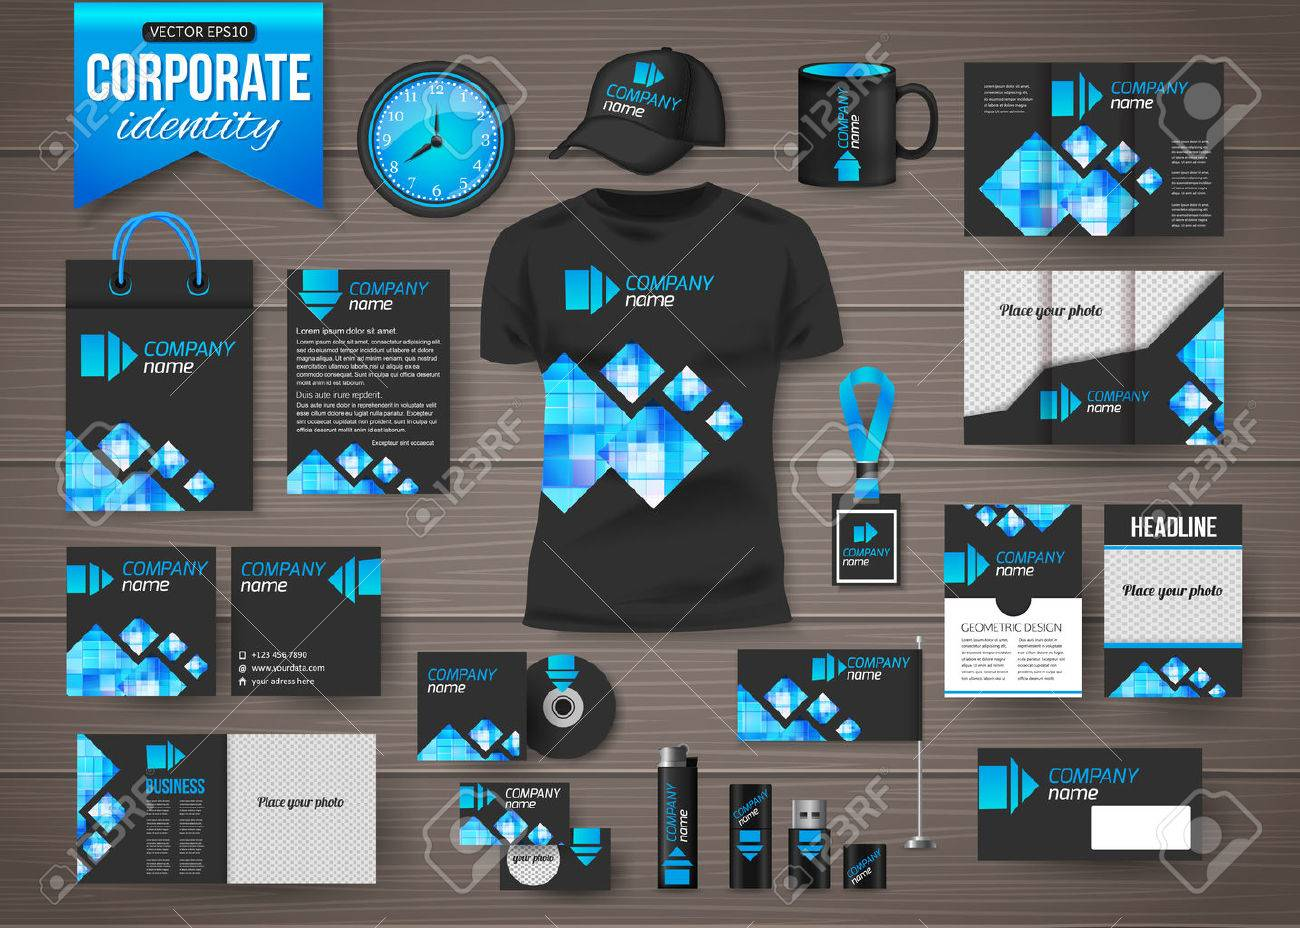 corporate identity business photorealistic design template over